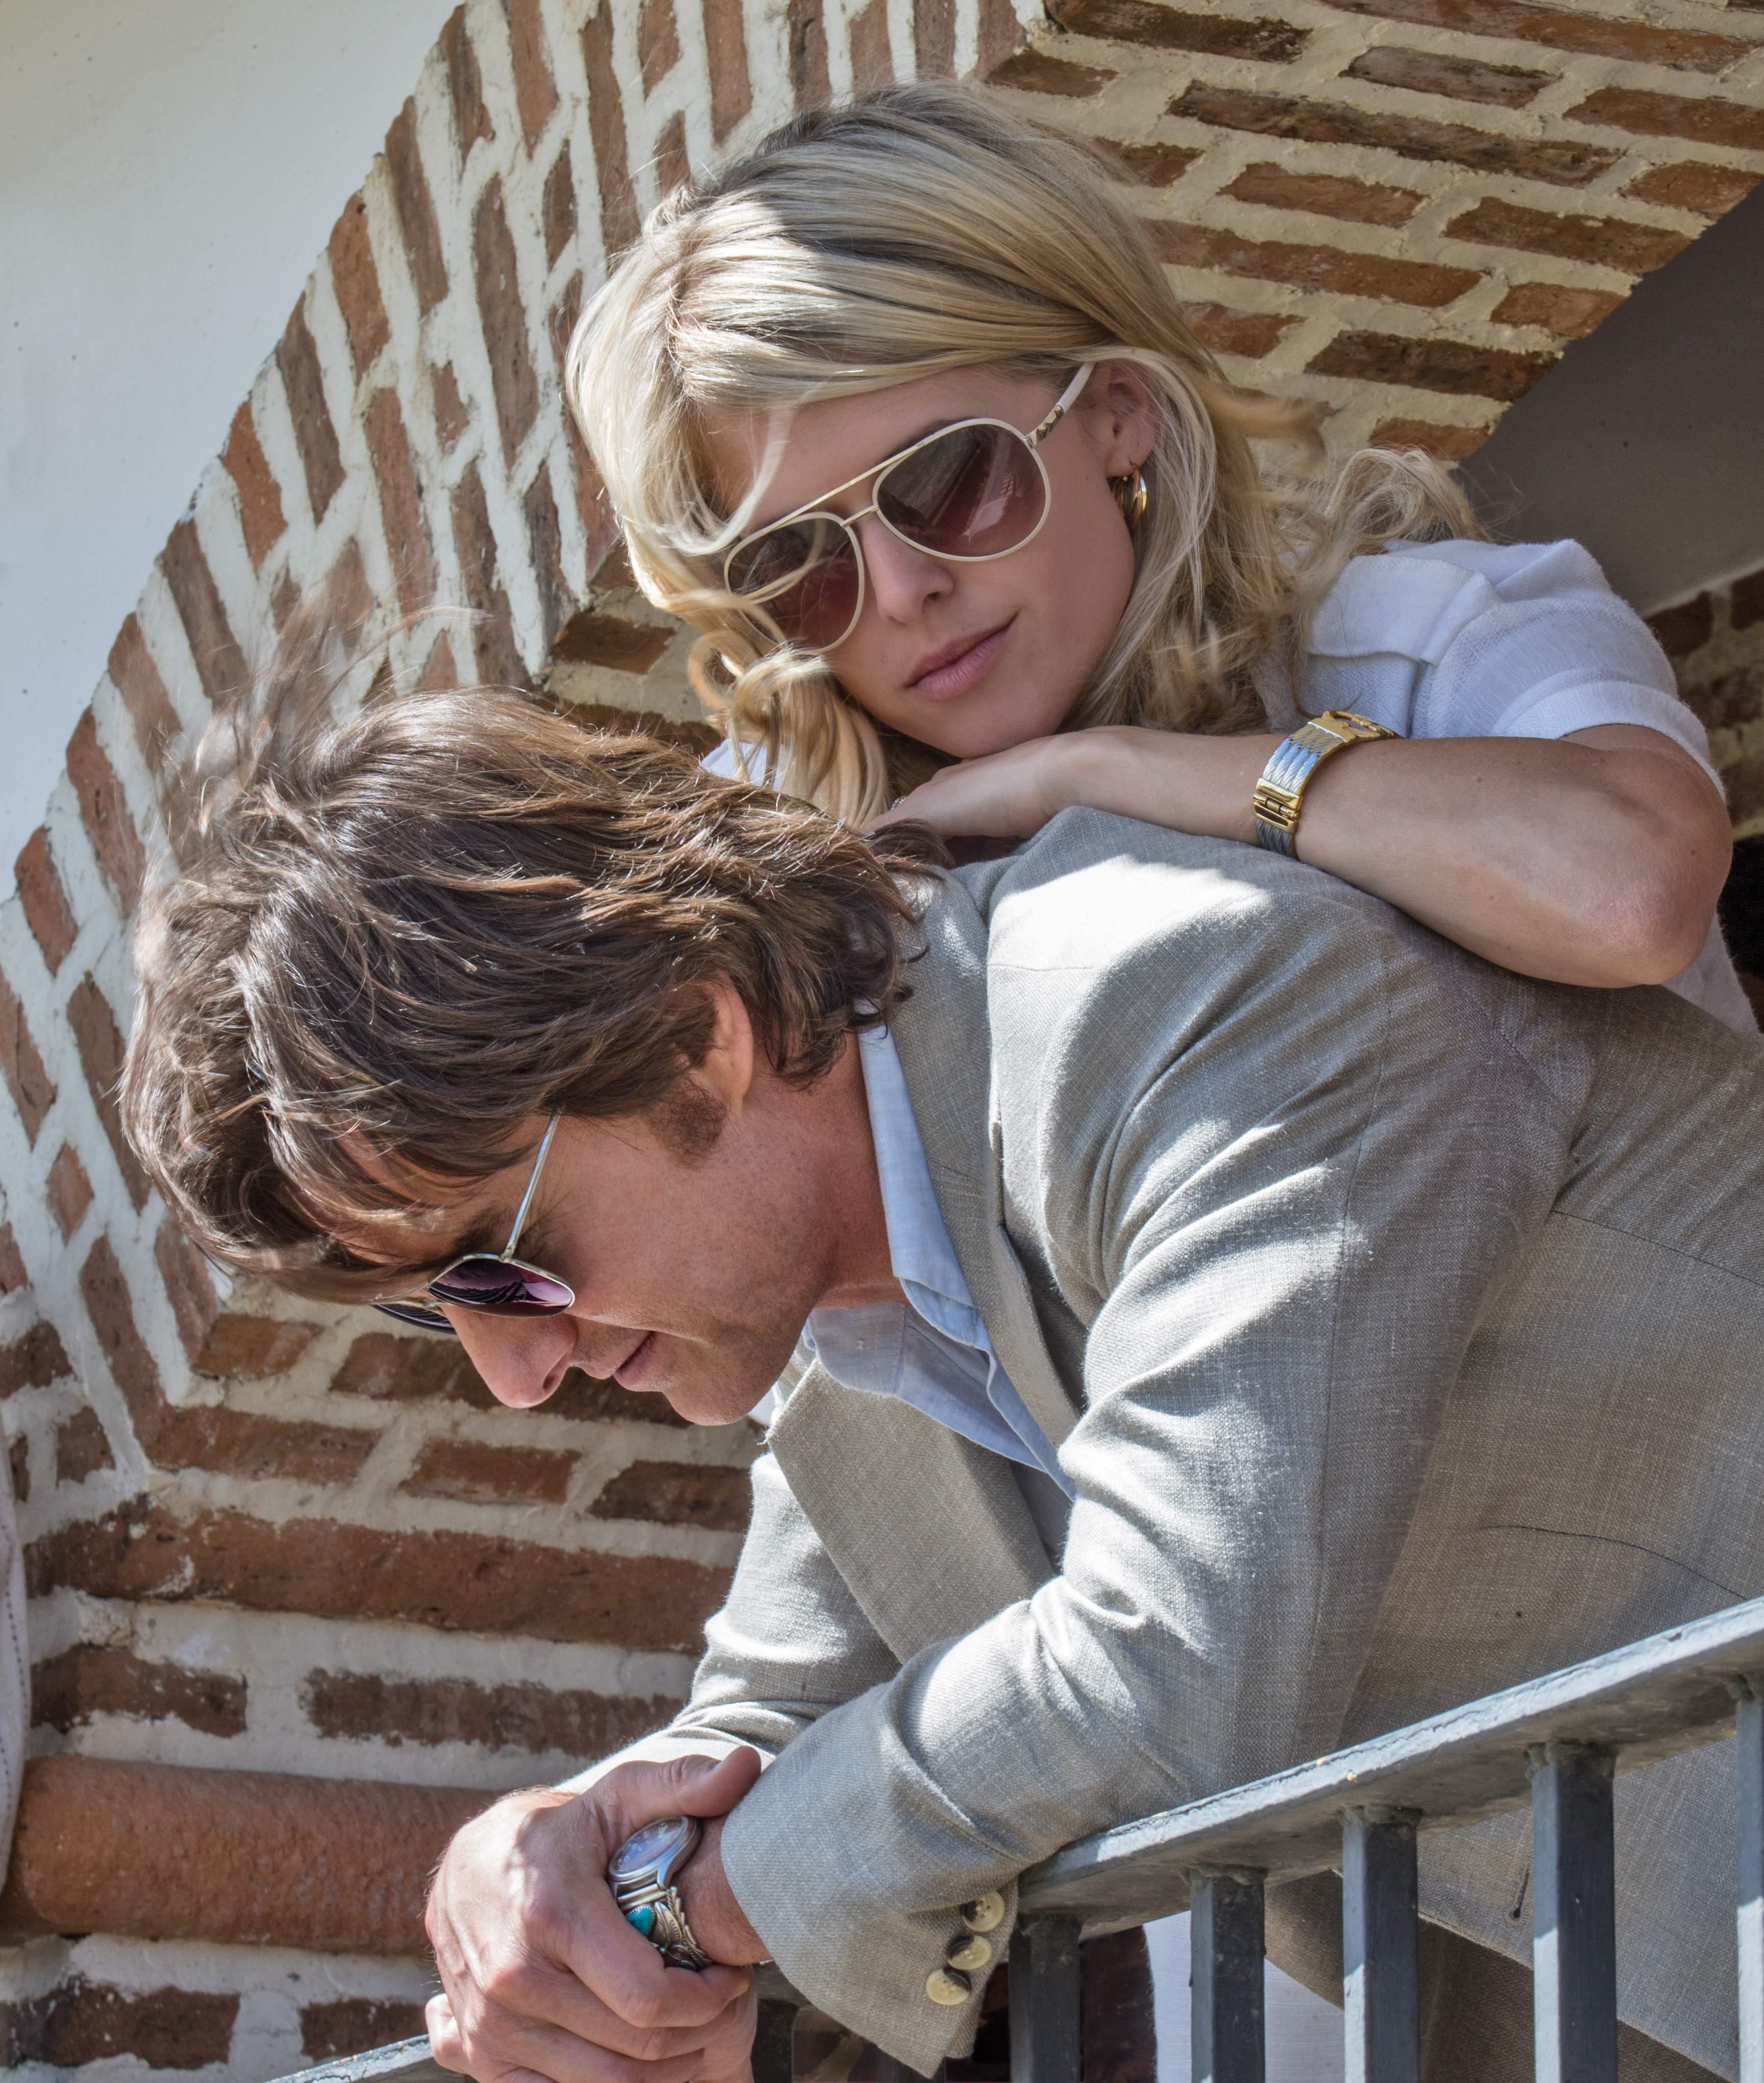 Sarah Wright and Tom Cruise